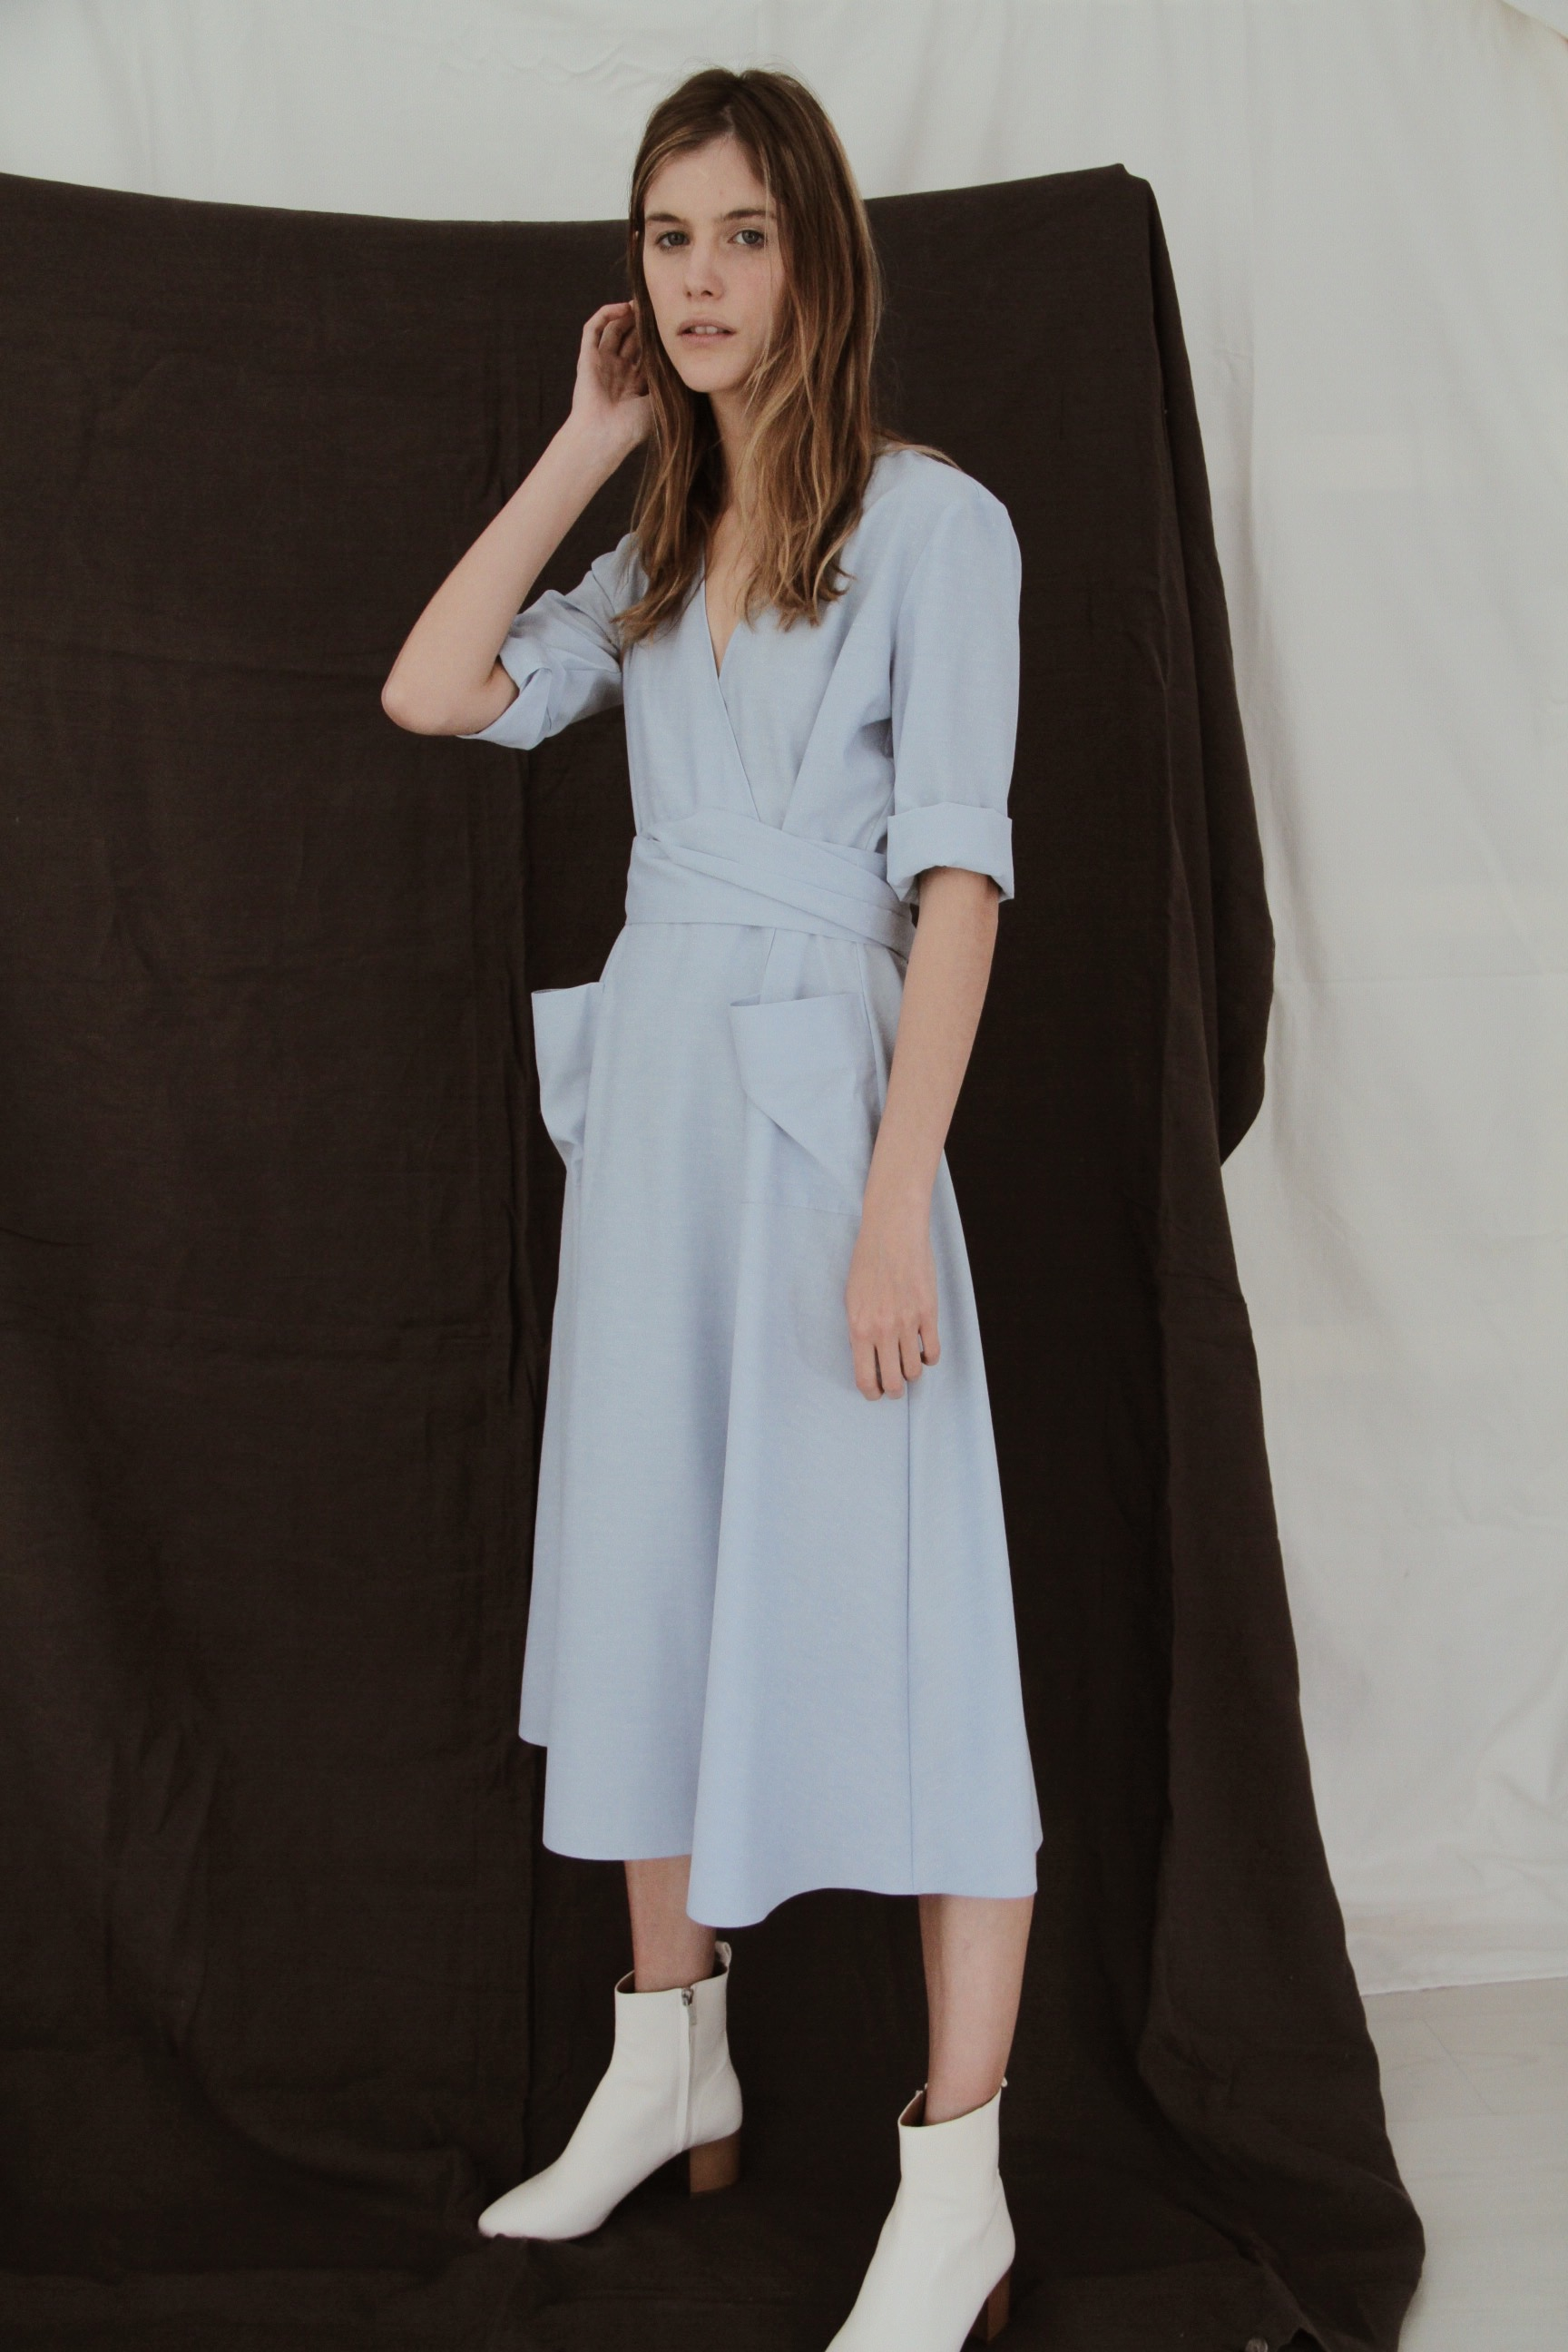 numero 5 dress 1